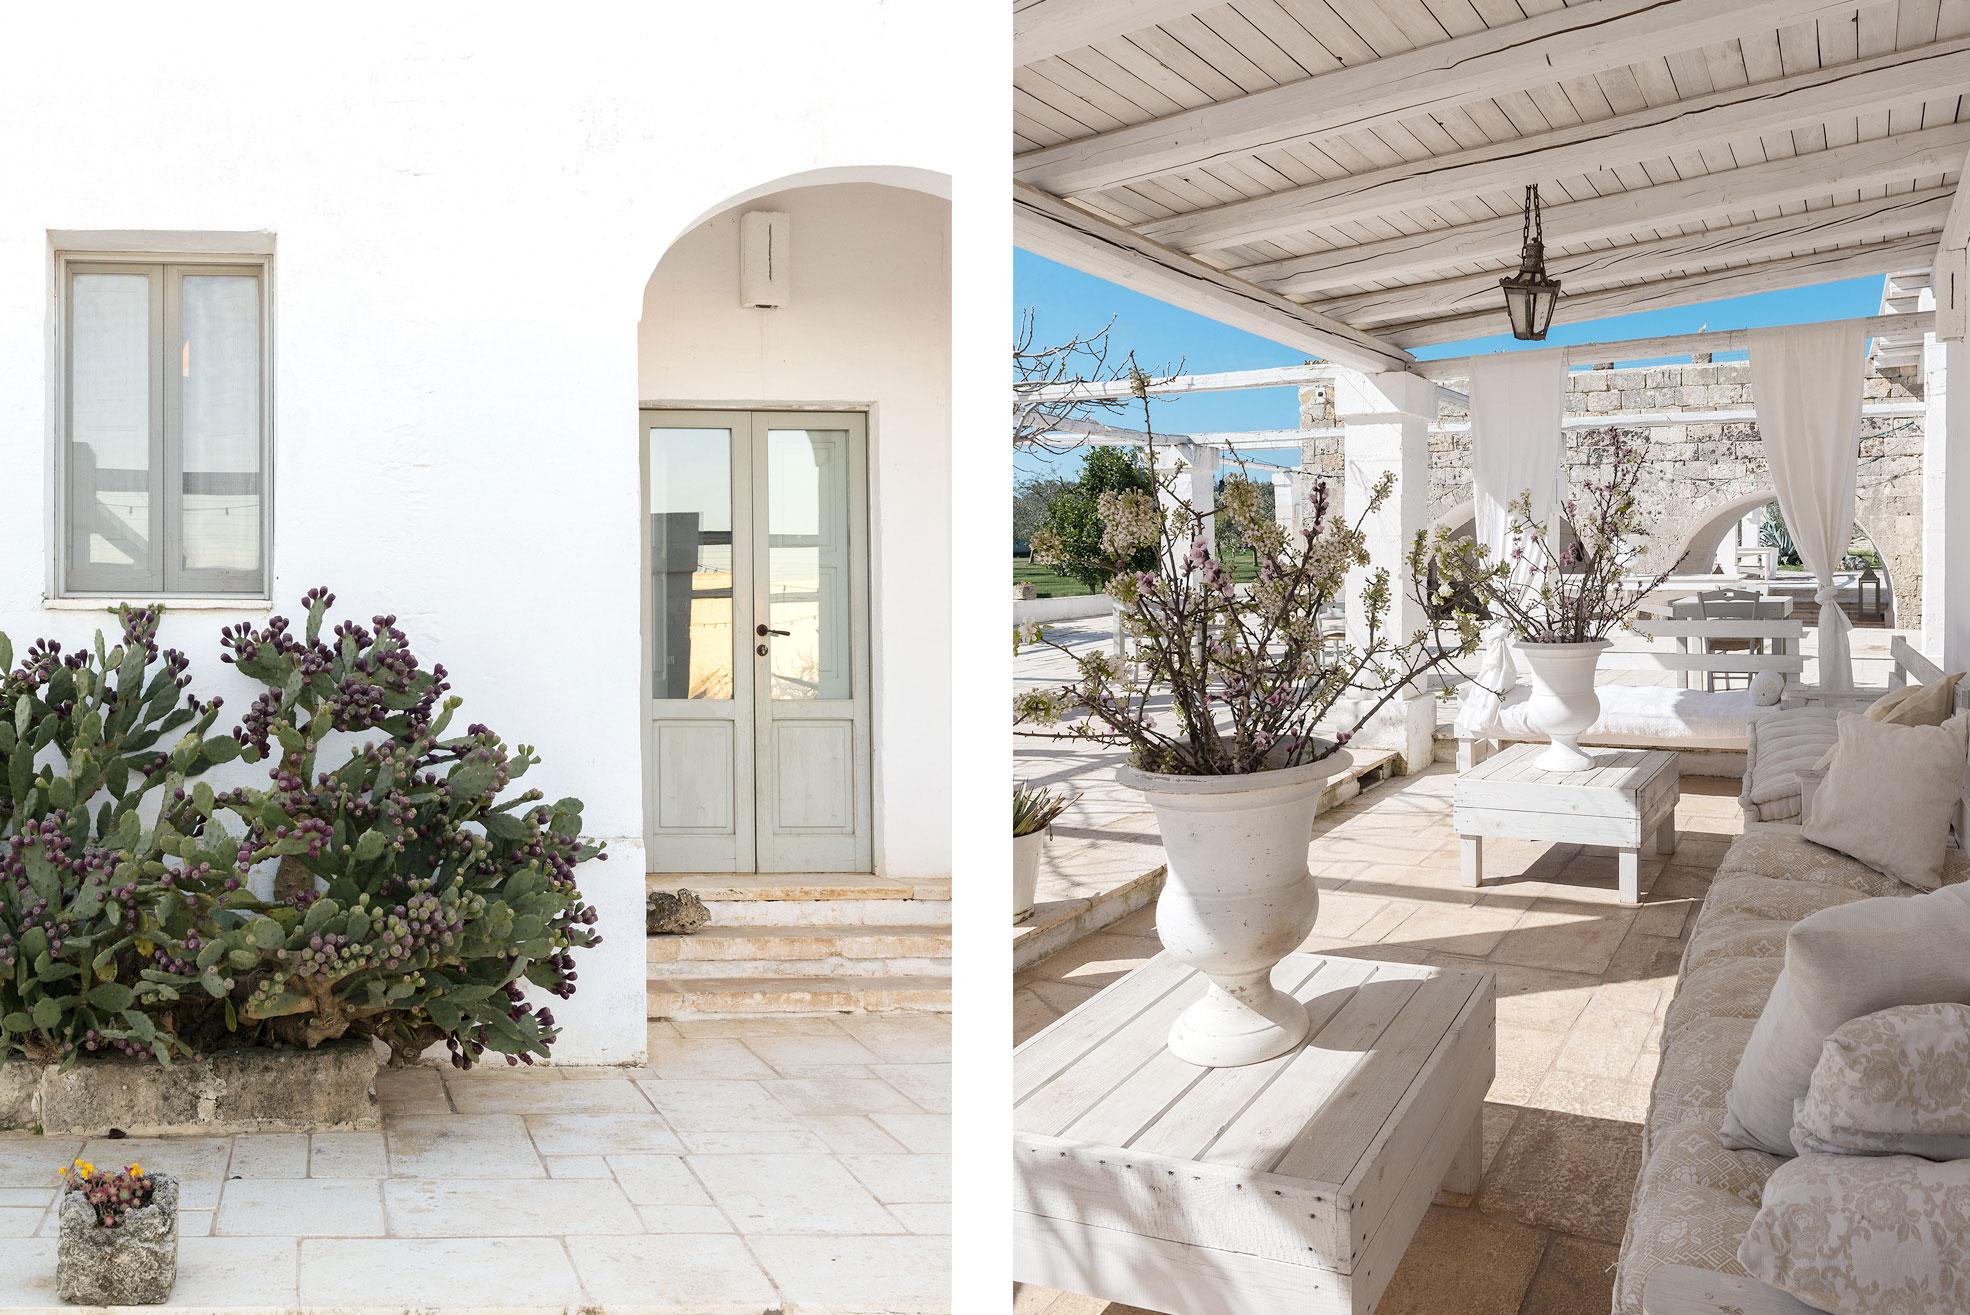 Detail of exterior longue area in Masseria Potenti in Puglia Photographer Maria Teresa Furnari